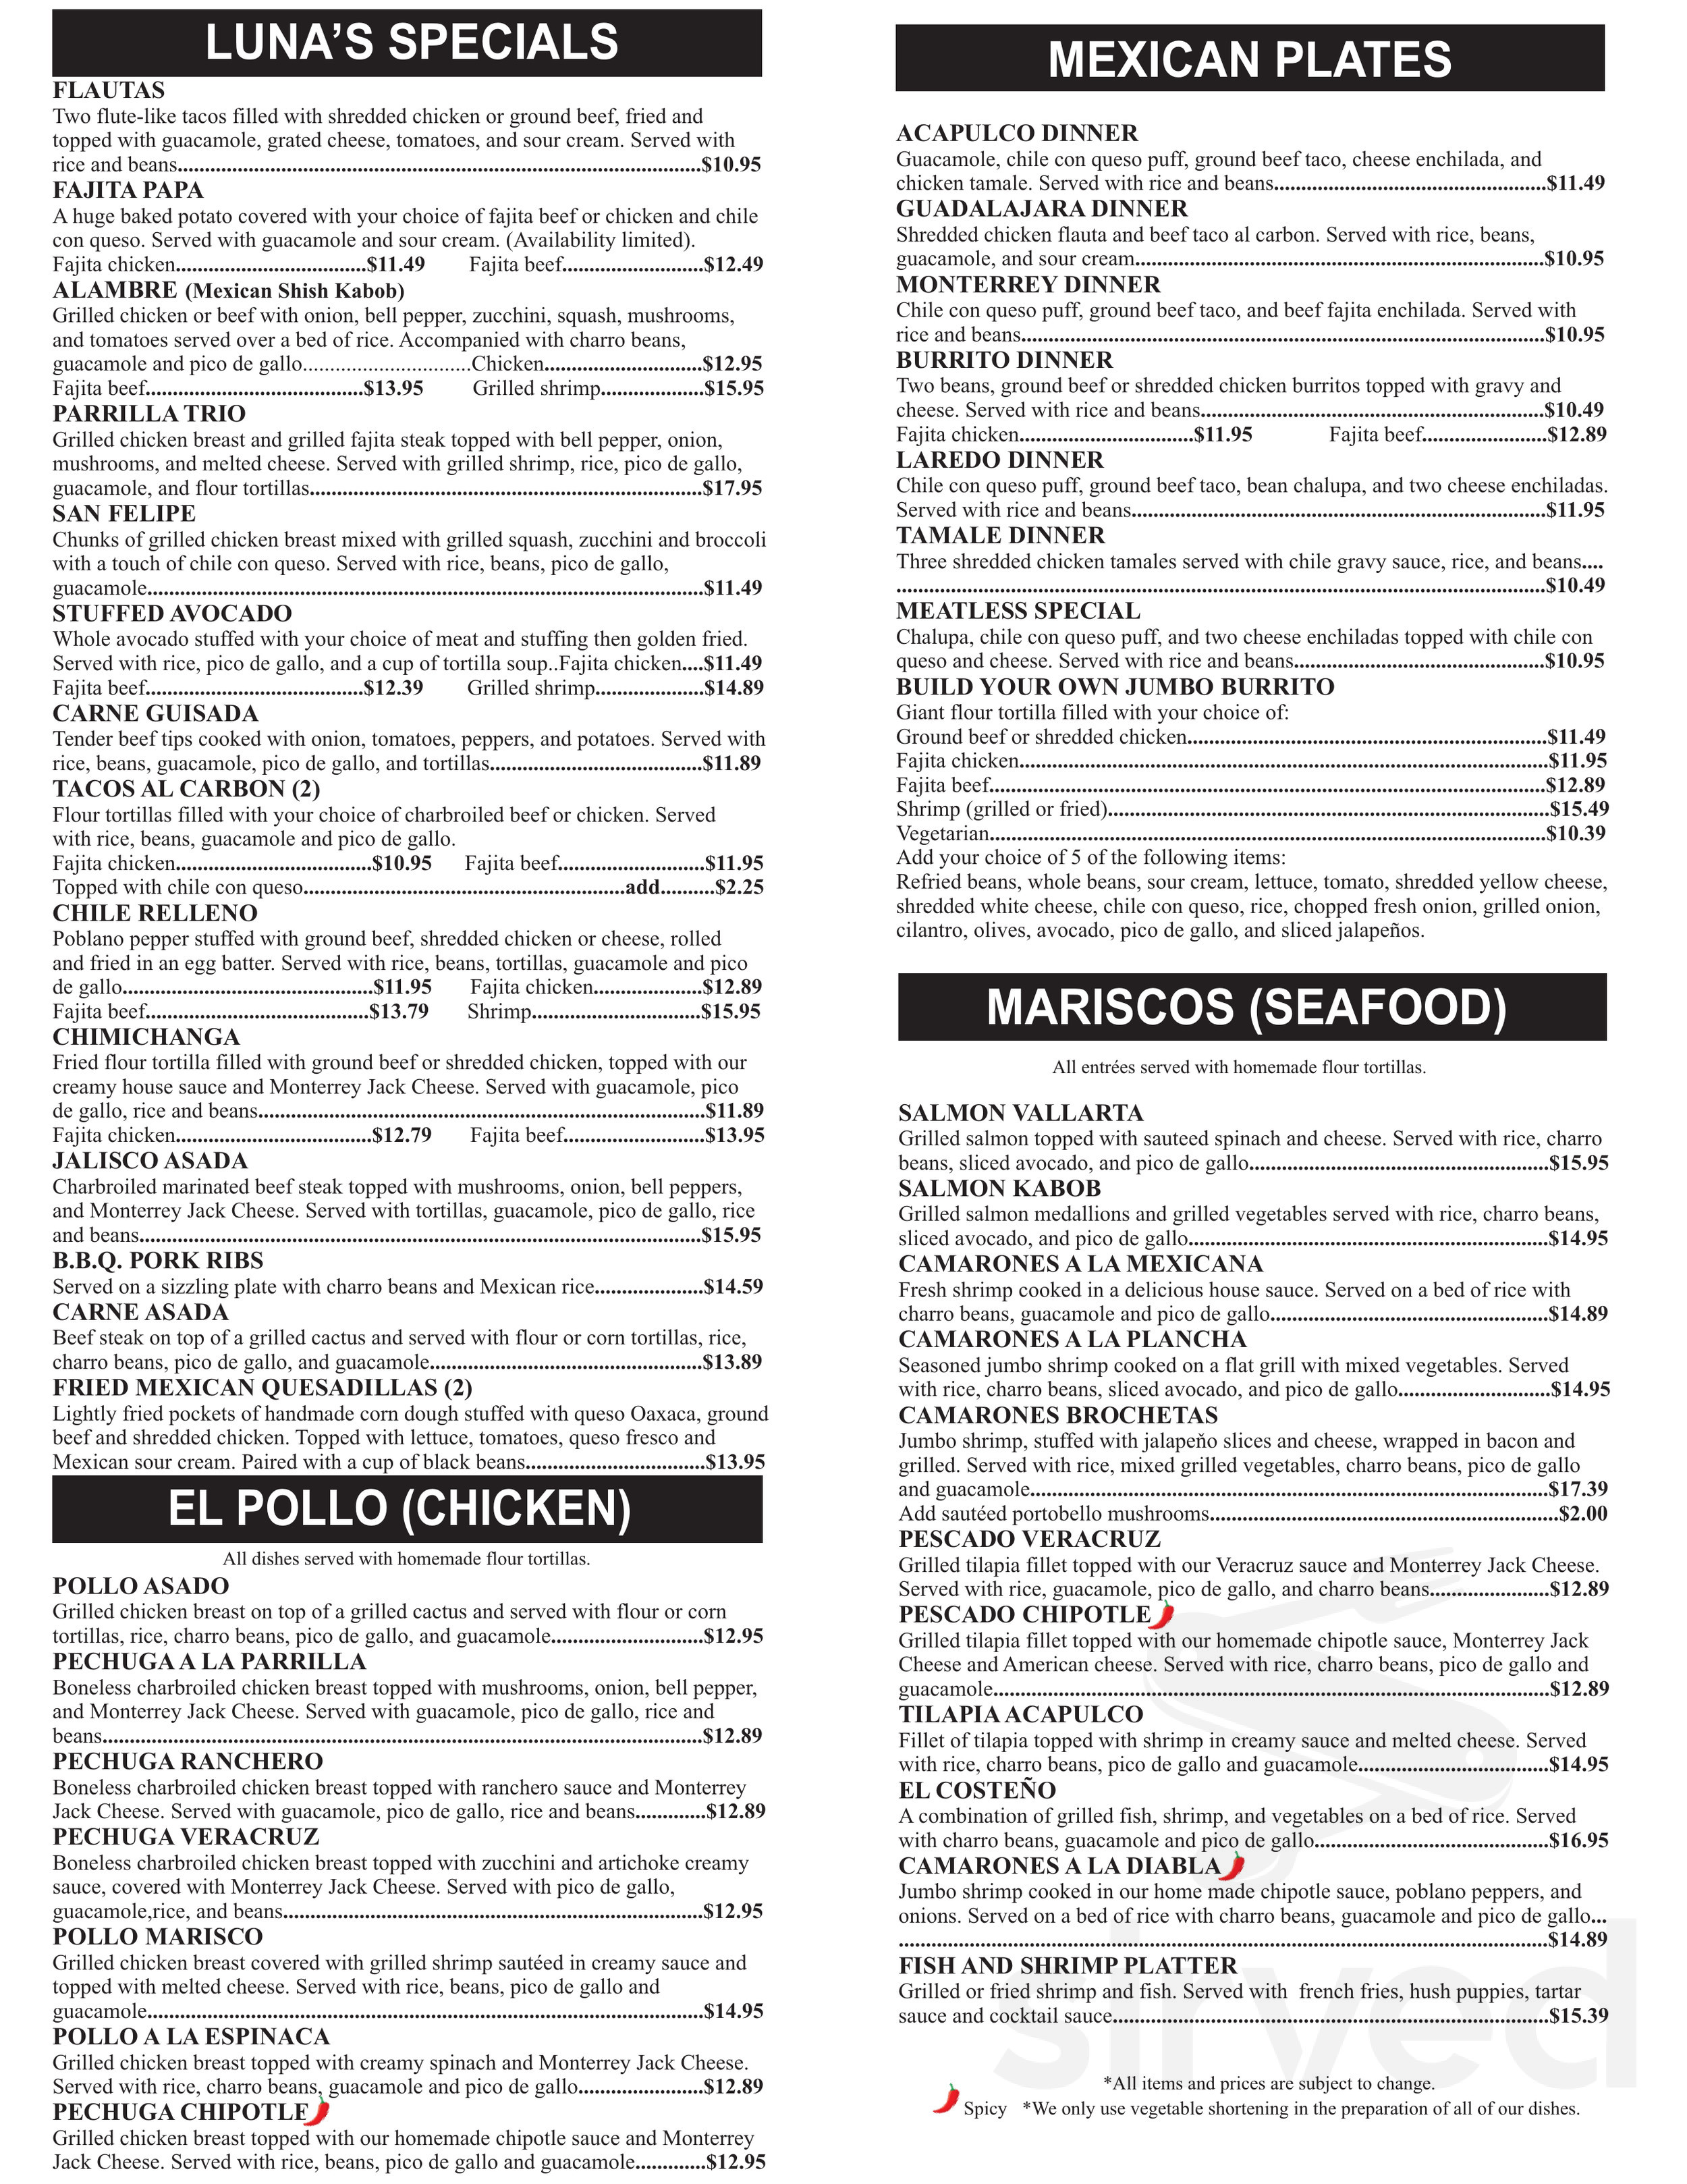 Luna S Mexican Restaurant Menu In League City Texas Usa